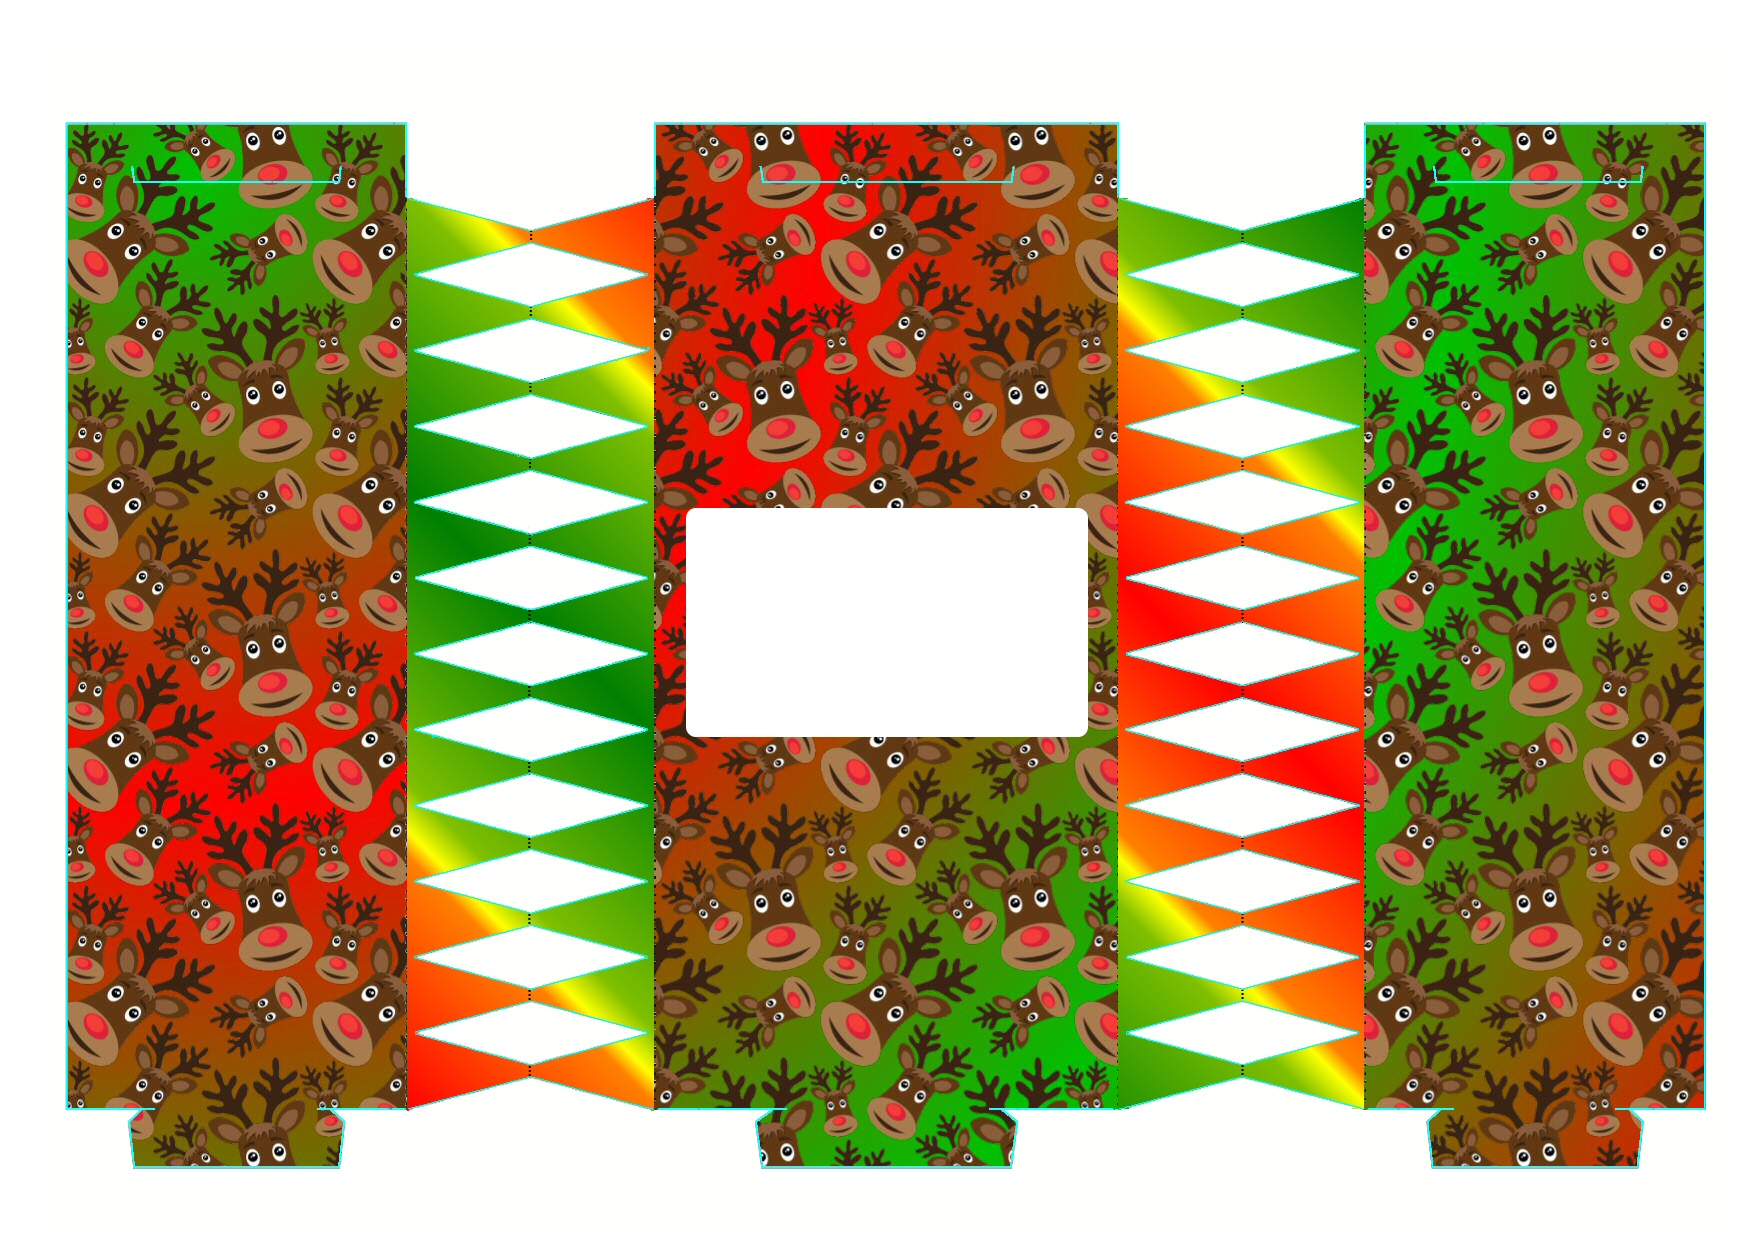 Christmas Cracker Template.Downloadable Christmas Cracker Templates Free Craft Downloads